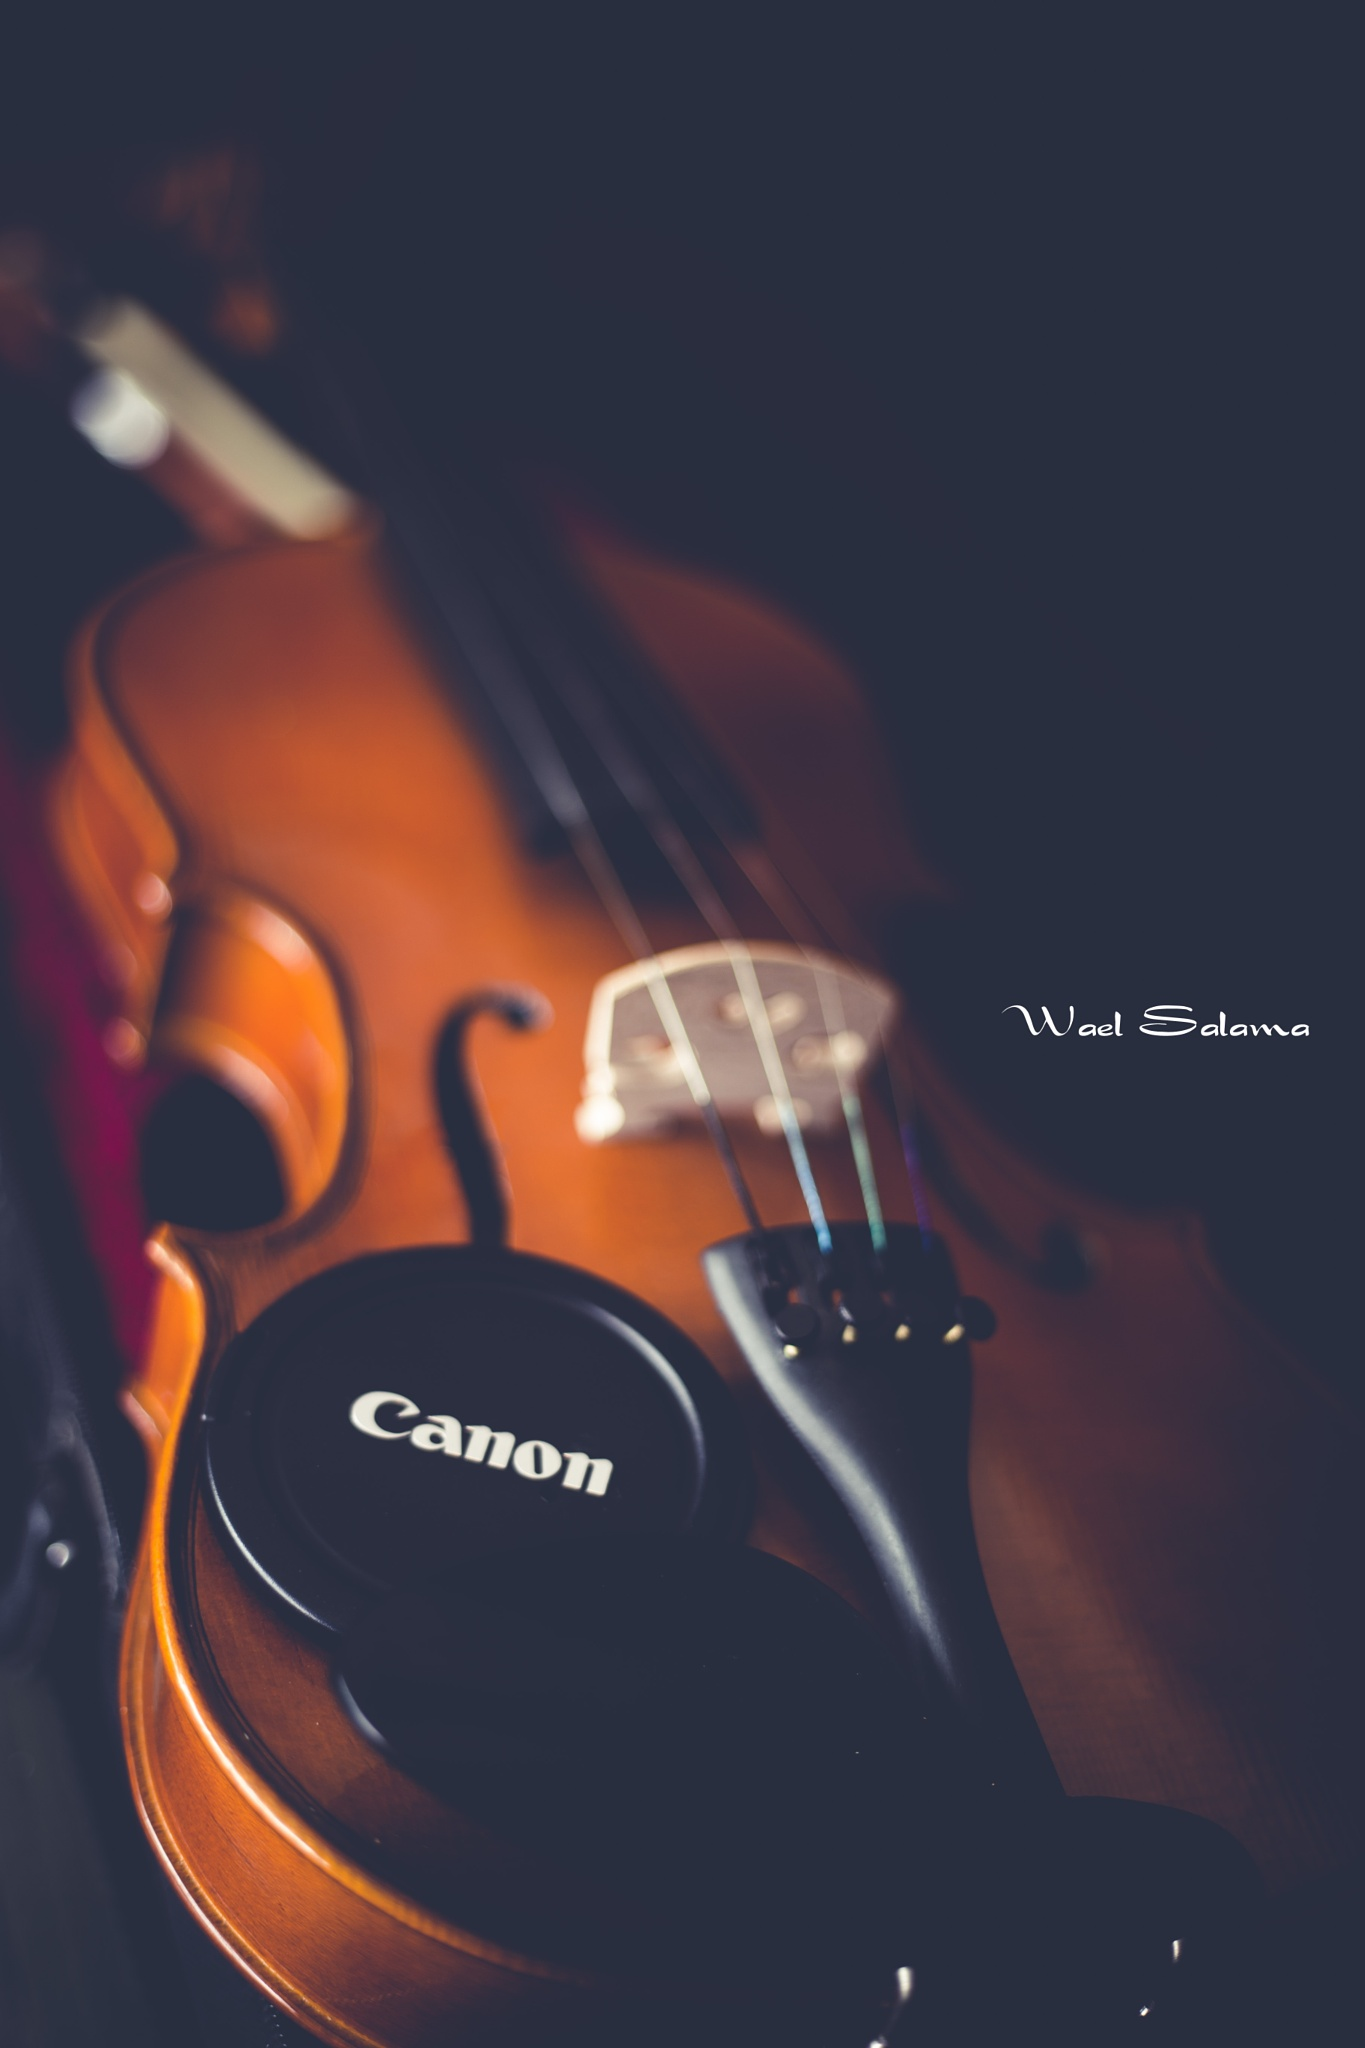 the magic of music and ph by Wael Salama